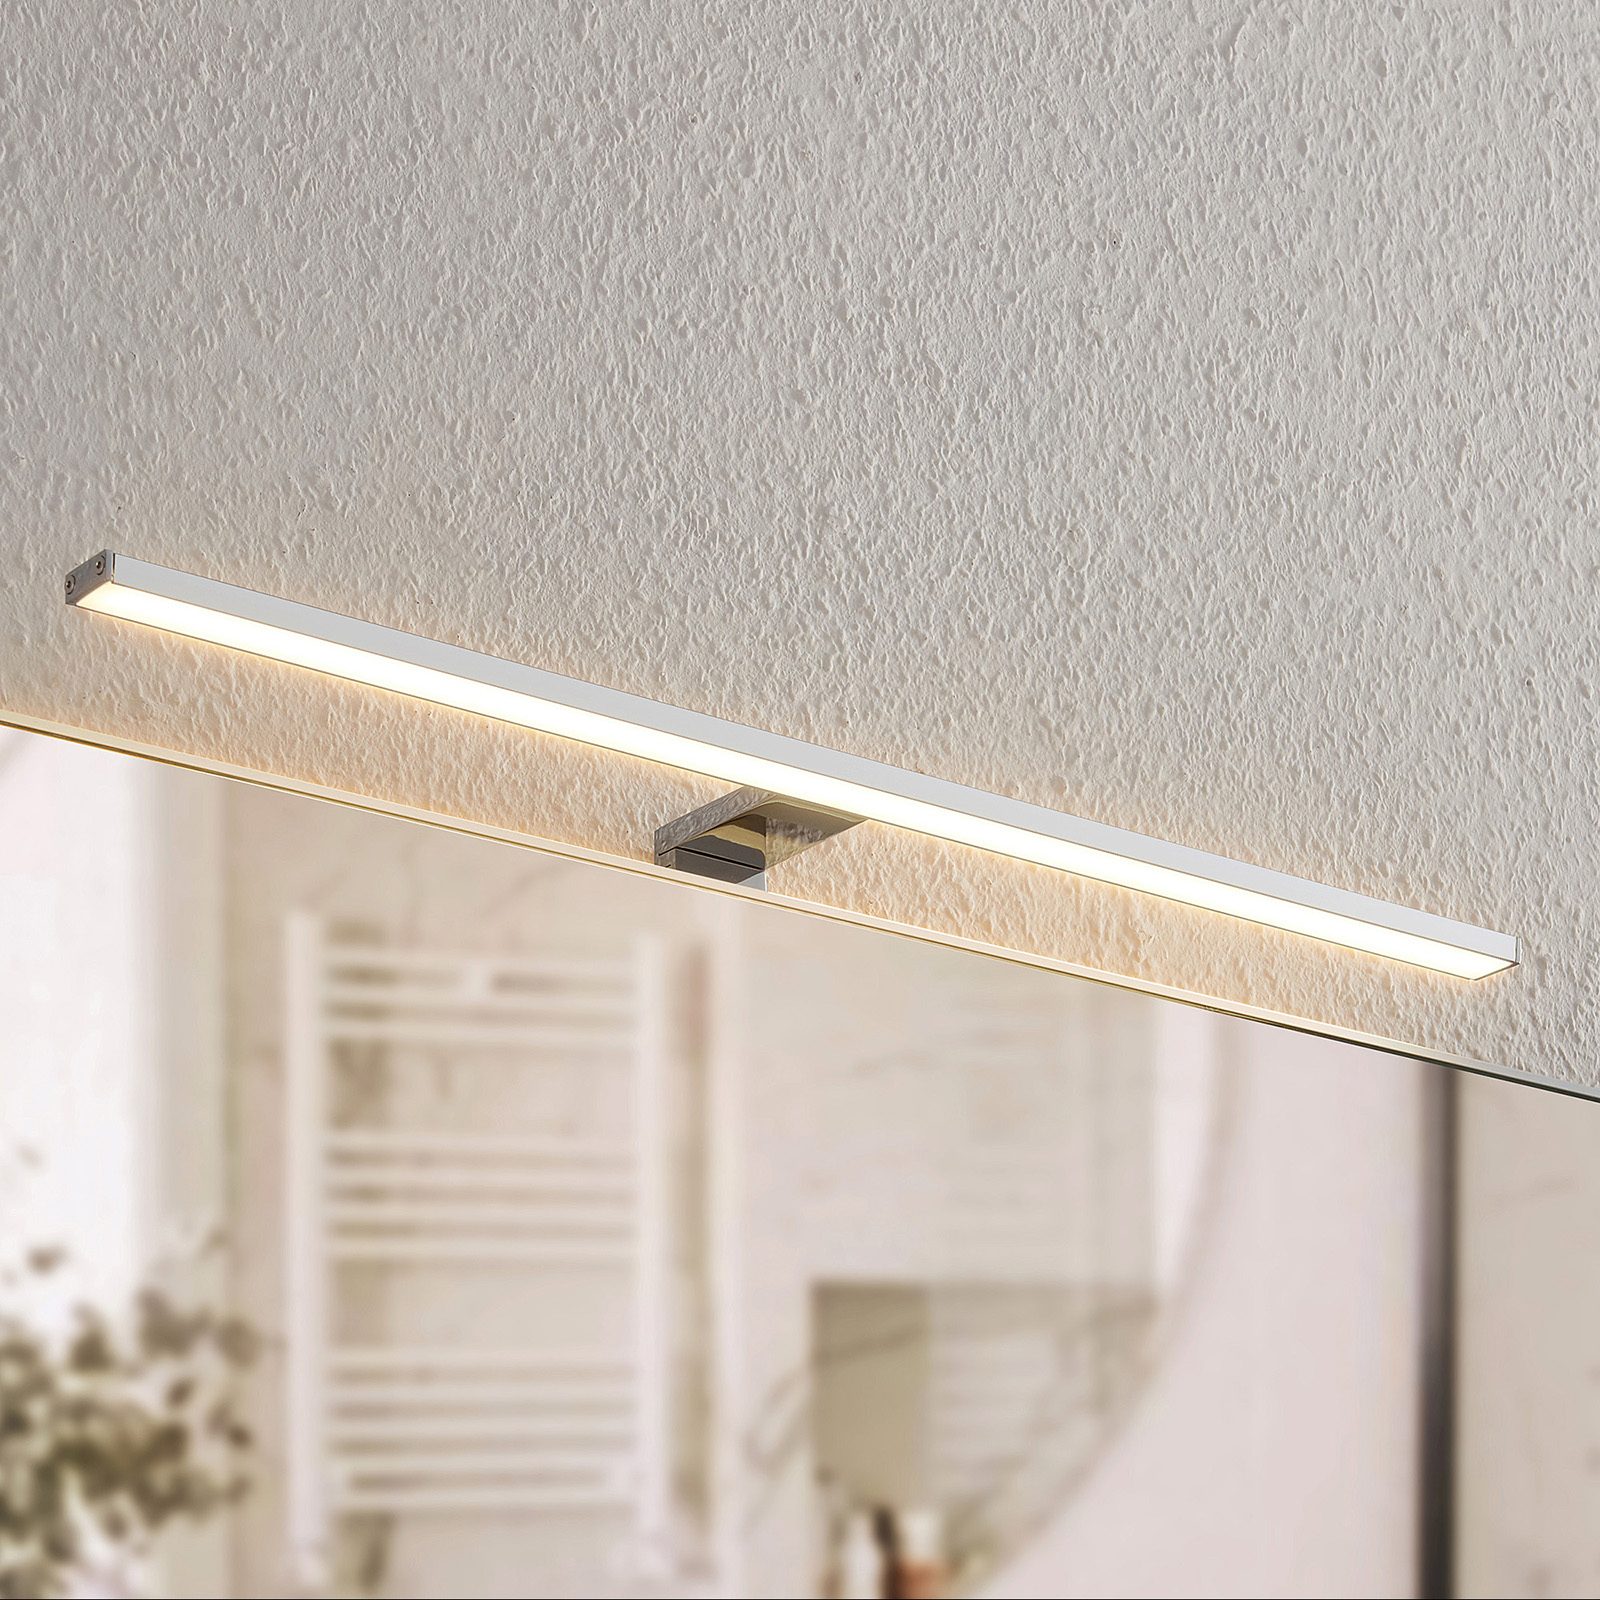 Lindby Daitani oświetlenie lustra LED, 60,5 cm